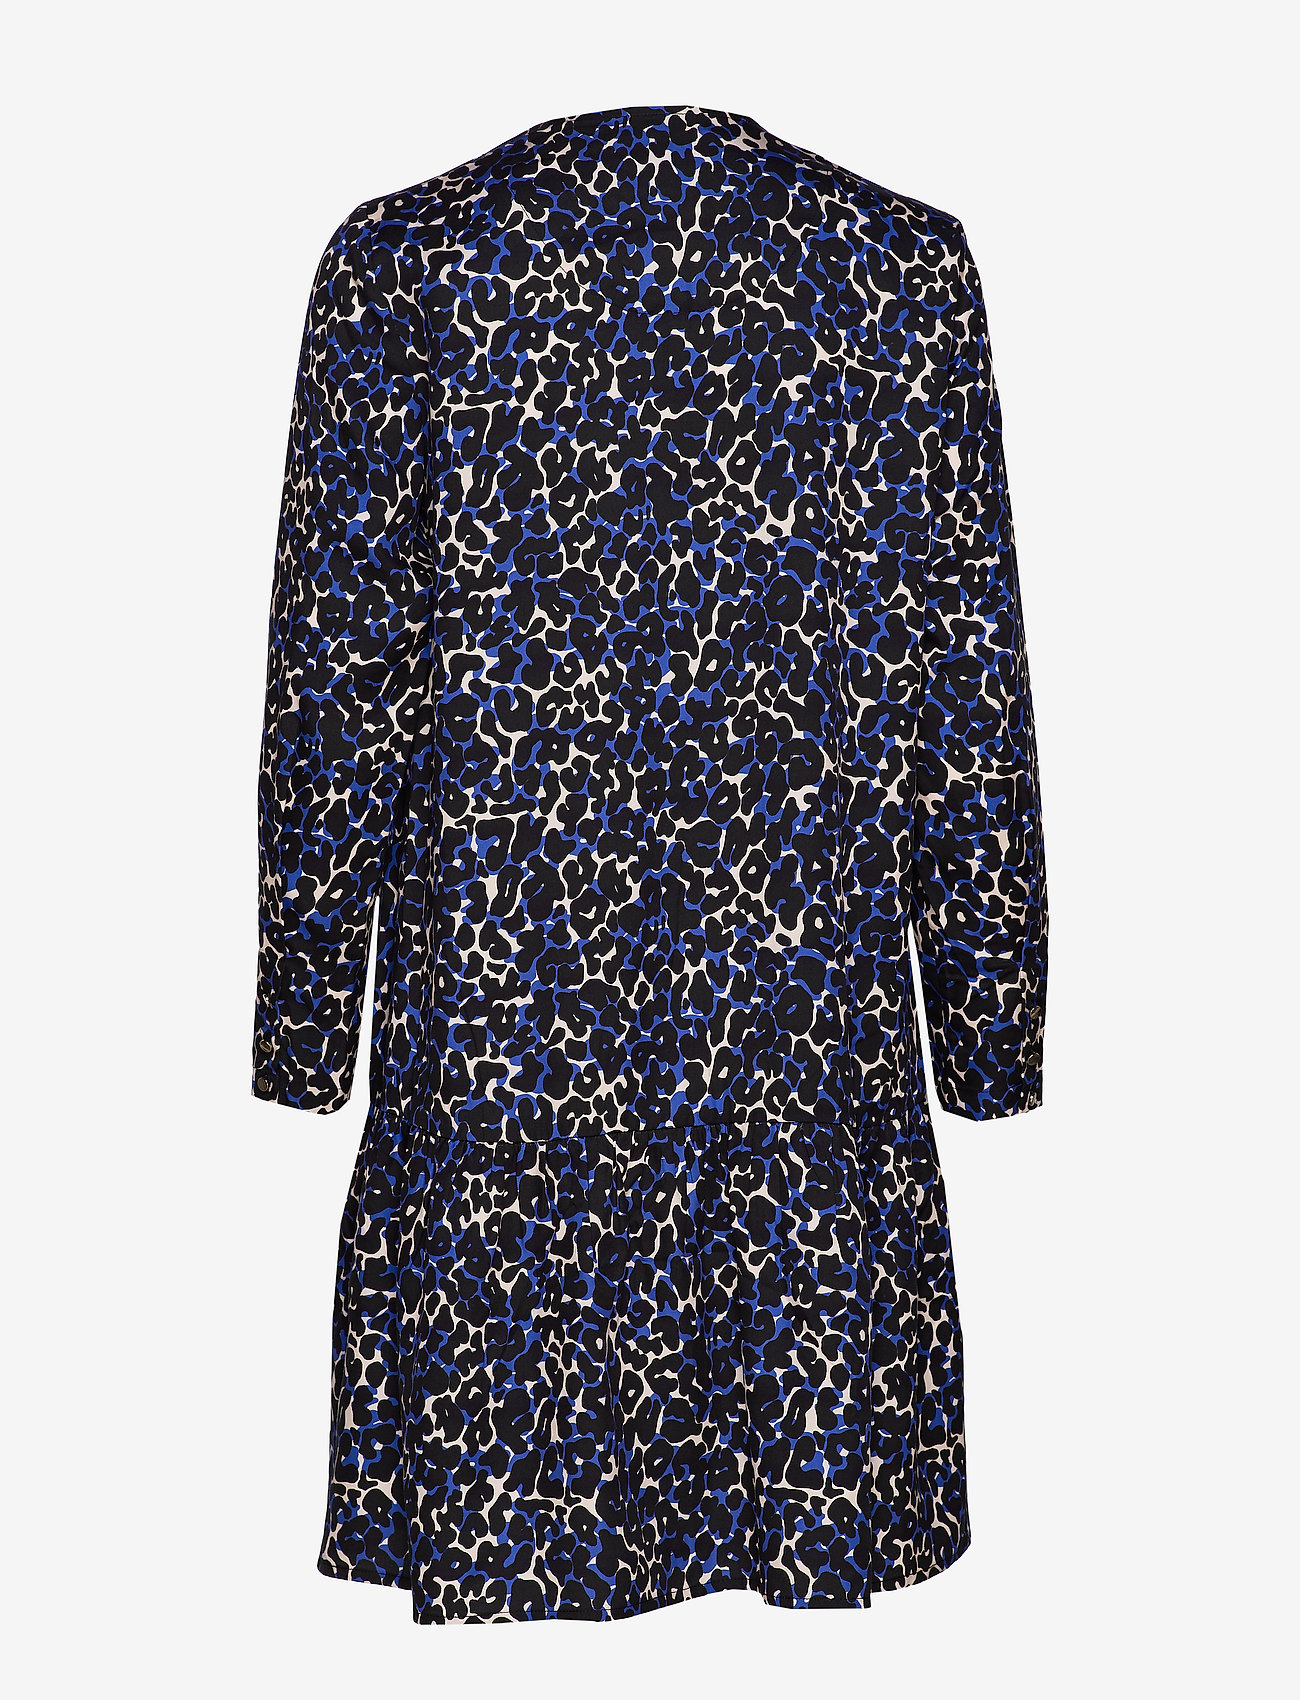 Mila Short Dress (Leopard Print) (104 €) - Storm & Marie KJz64